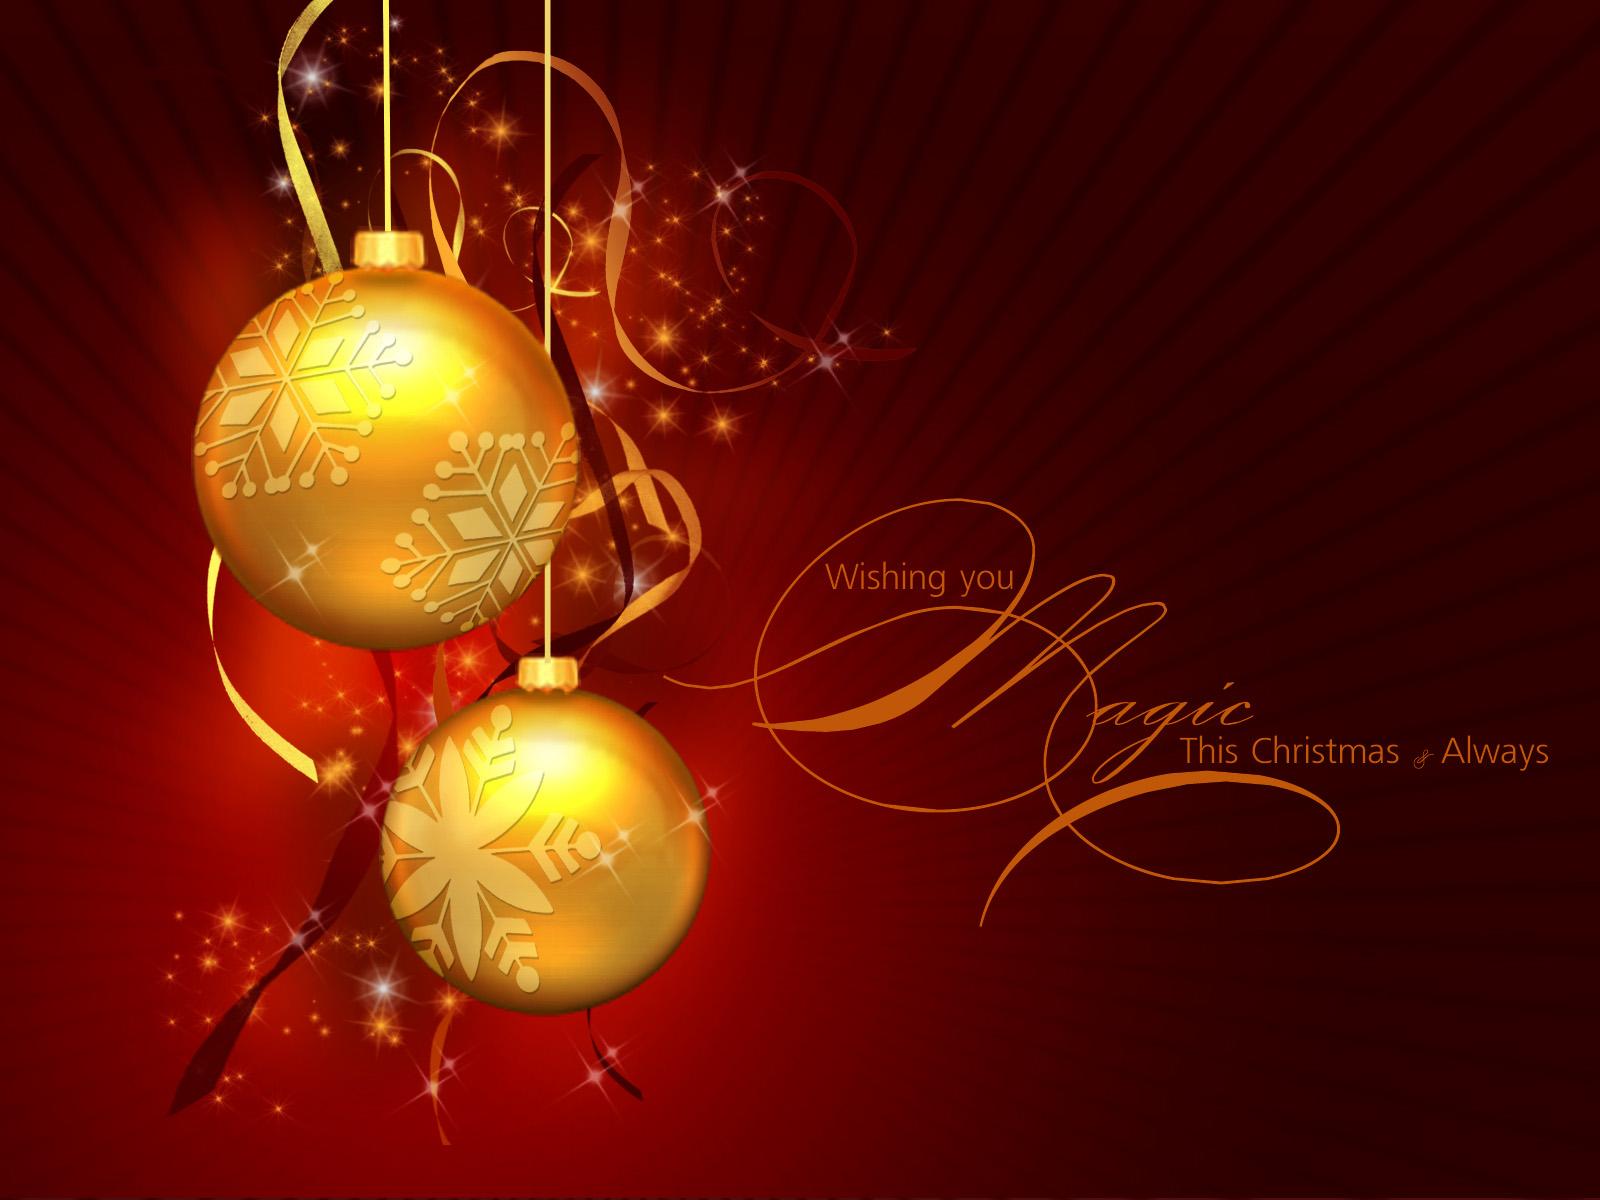 IPhone 1: 320x480 480x320 640x960 960x640 IPad 1: 1024x768 768x1024 IPad 2: 1024x1024. Tablet : 1280x1280. Dual Monitor : 2560x1024. Christmas Wallpaper ...